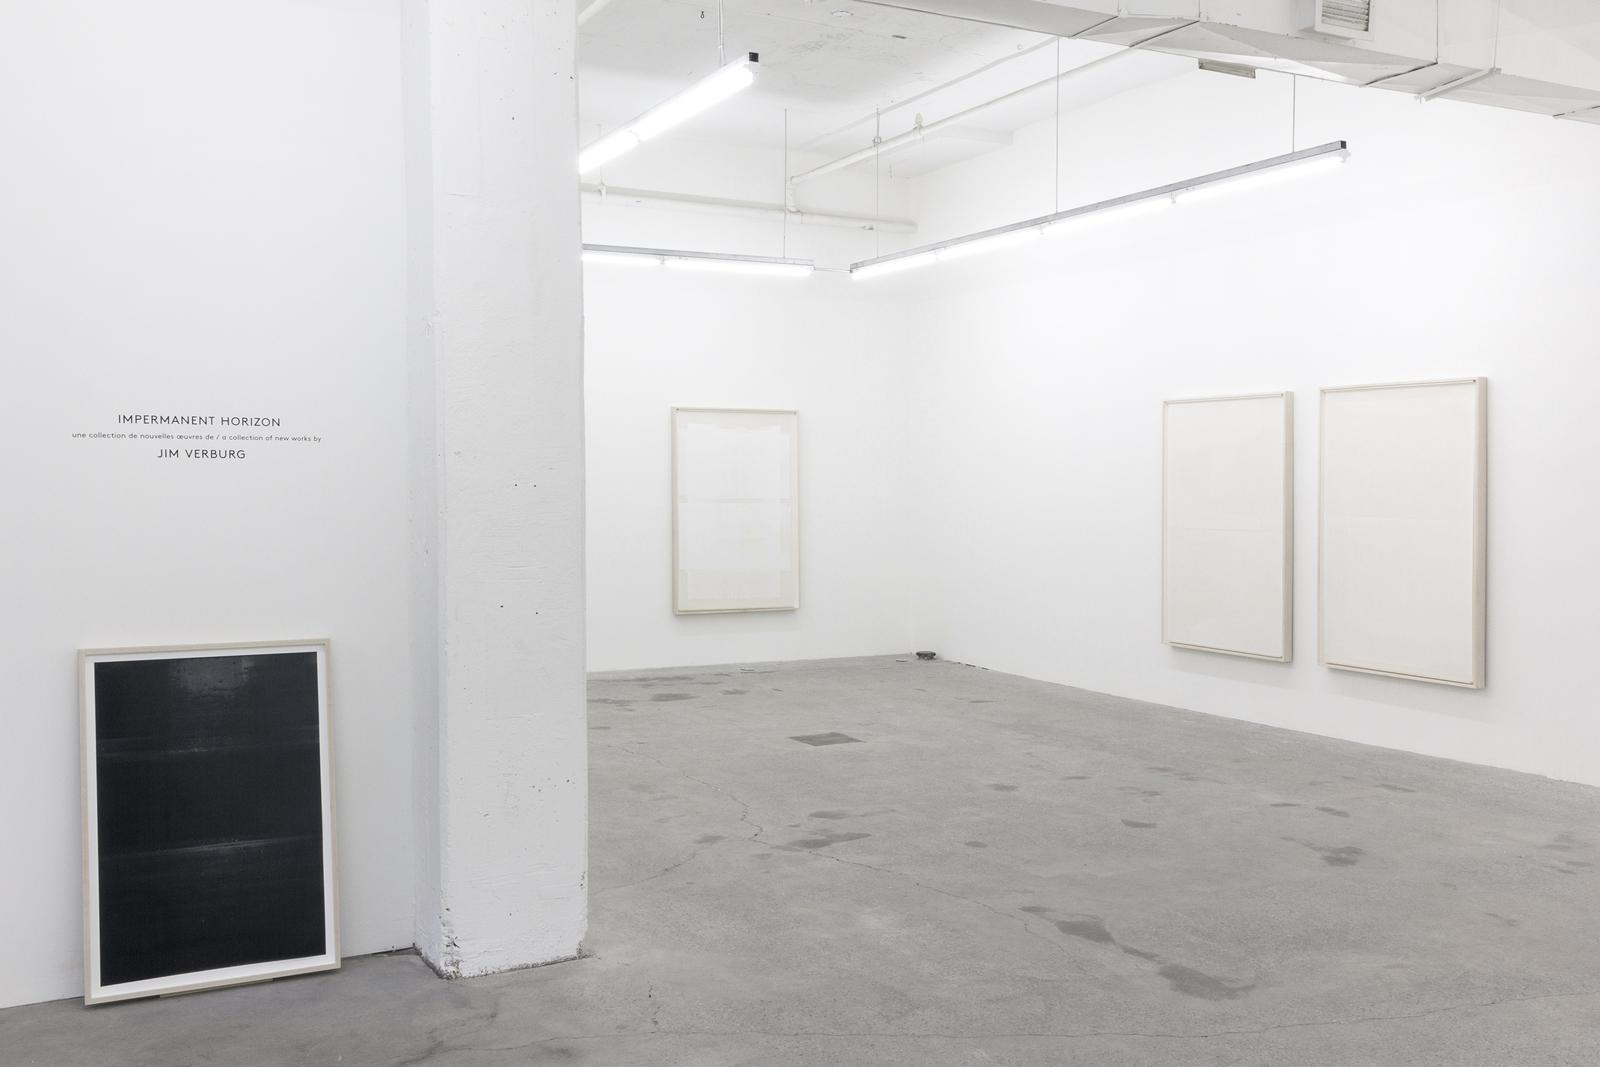 Jim Verburg,  Impermanent Horizon , 2016, exhibition view, Galerie Nicolas Robert